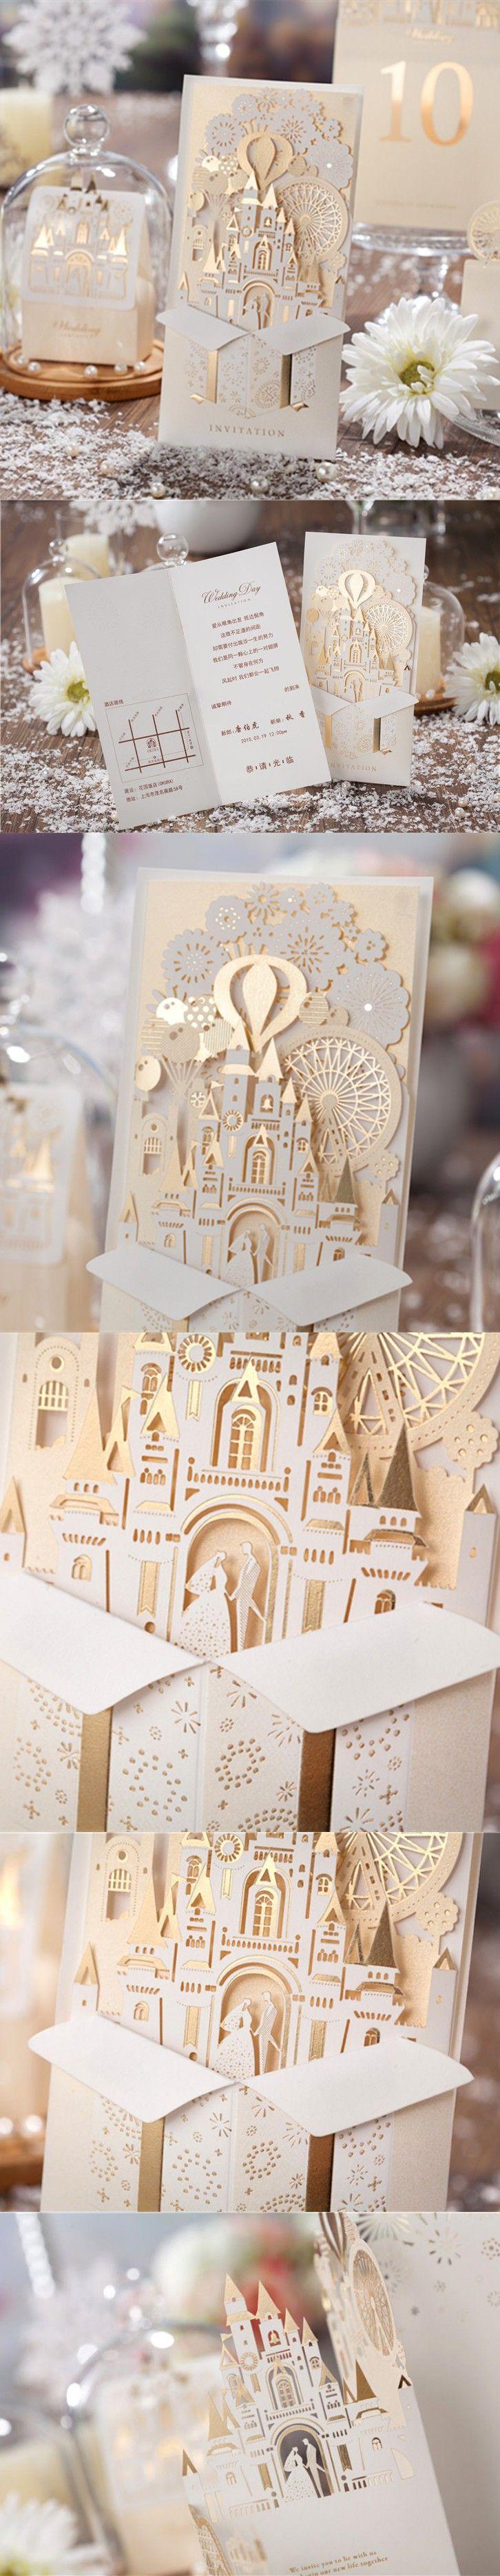 100pcs/lot Laser Cut Wedding Invitations Free Customize Bride and Groom Invitation Cards Castle Wedding Favors Casamento CW5093